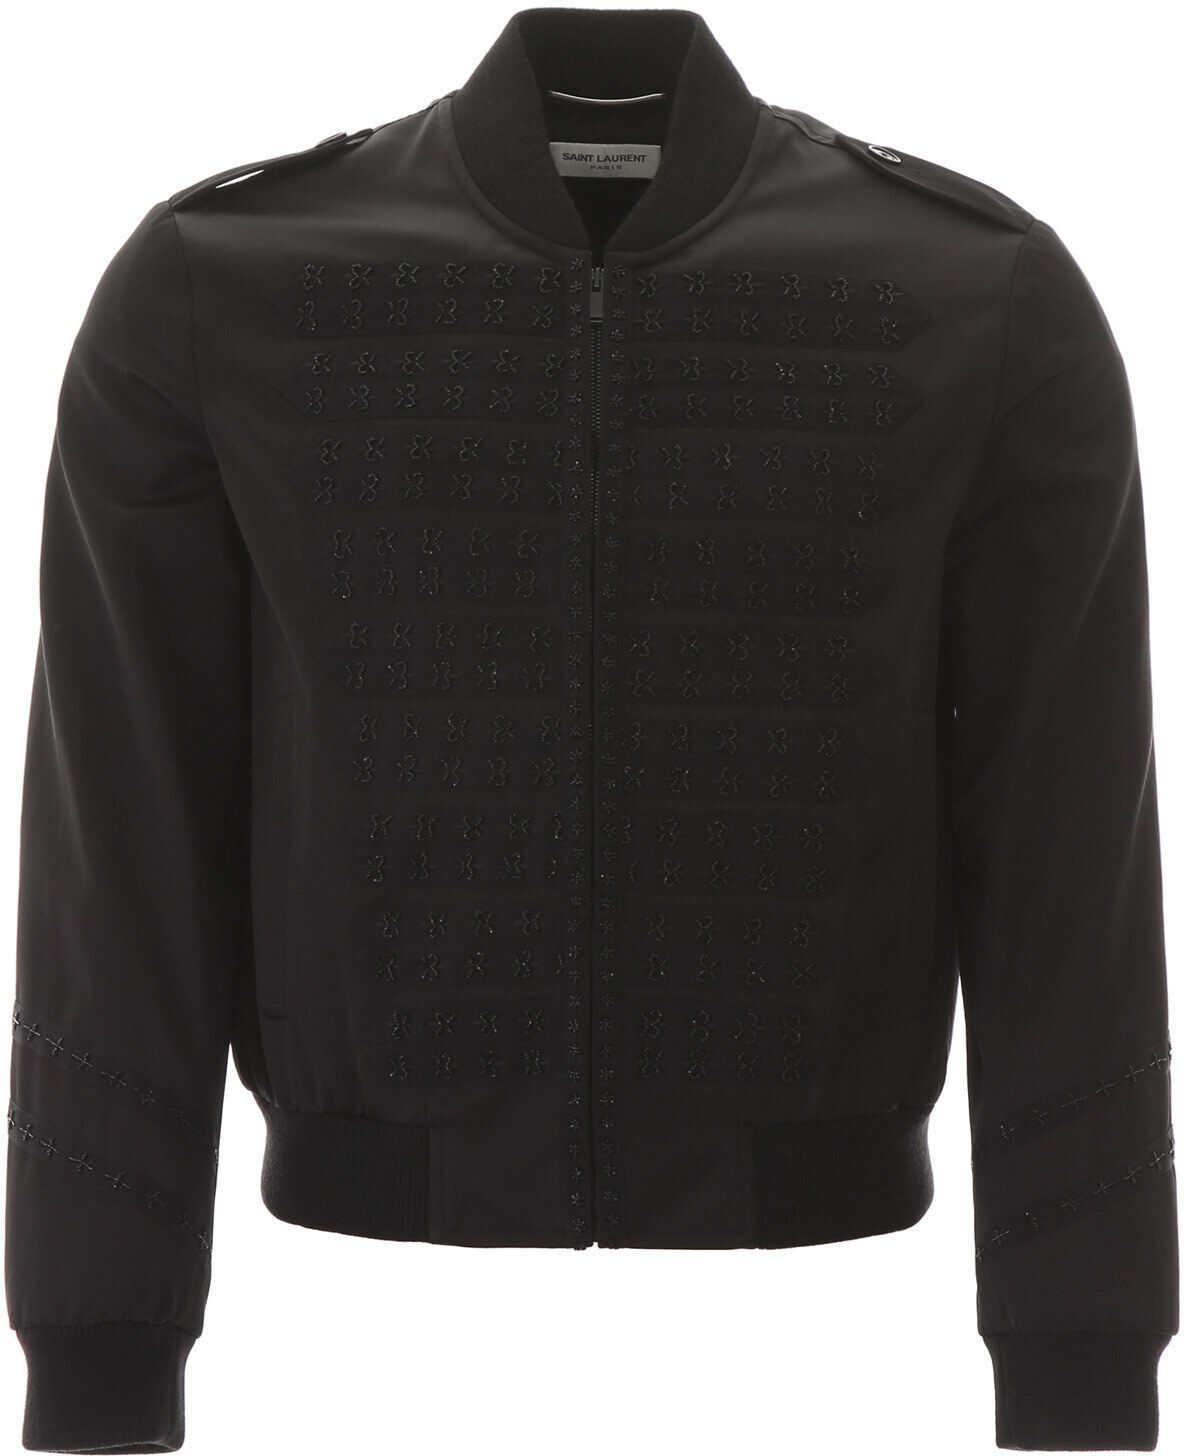 Saint Laurent Teddy Bomber Jacket With Bead Embroideries NOIR imagine